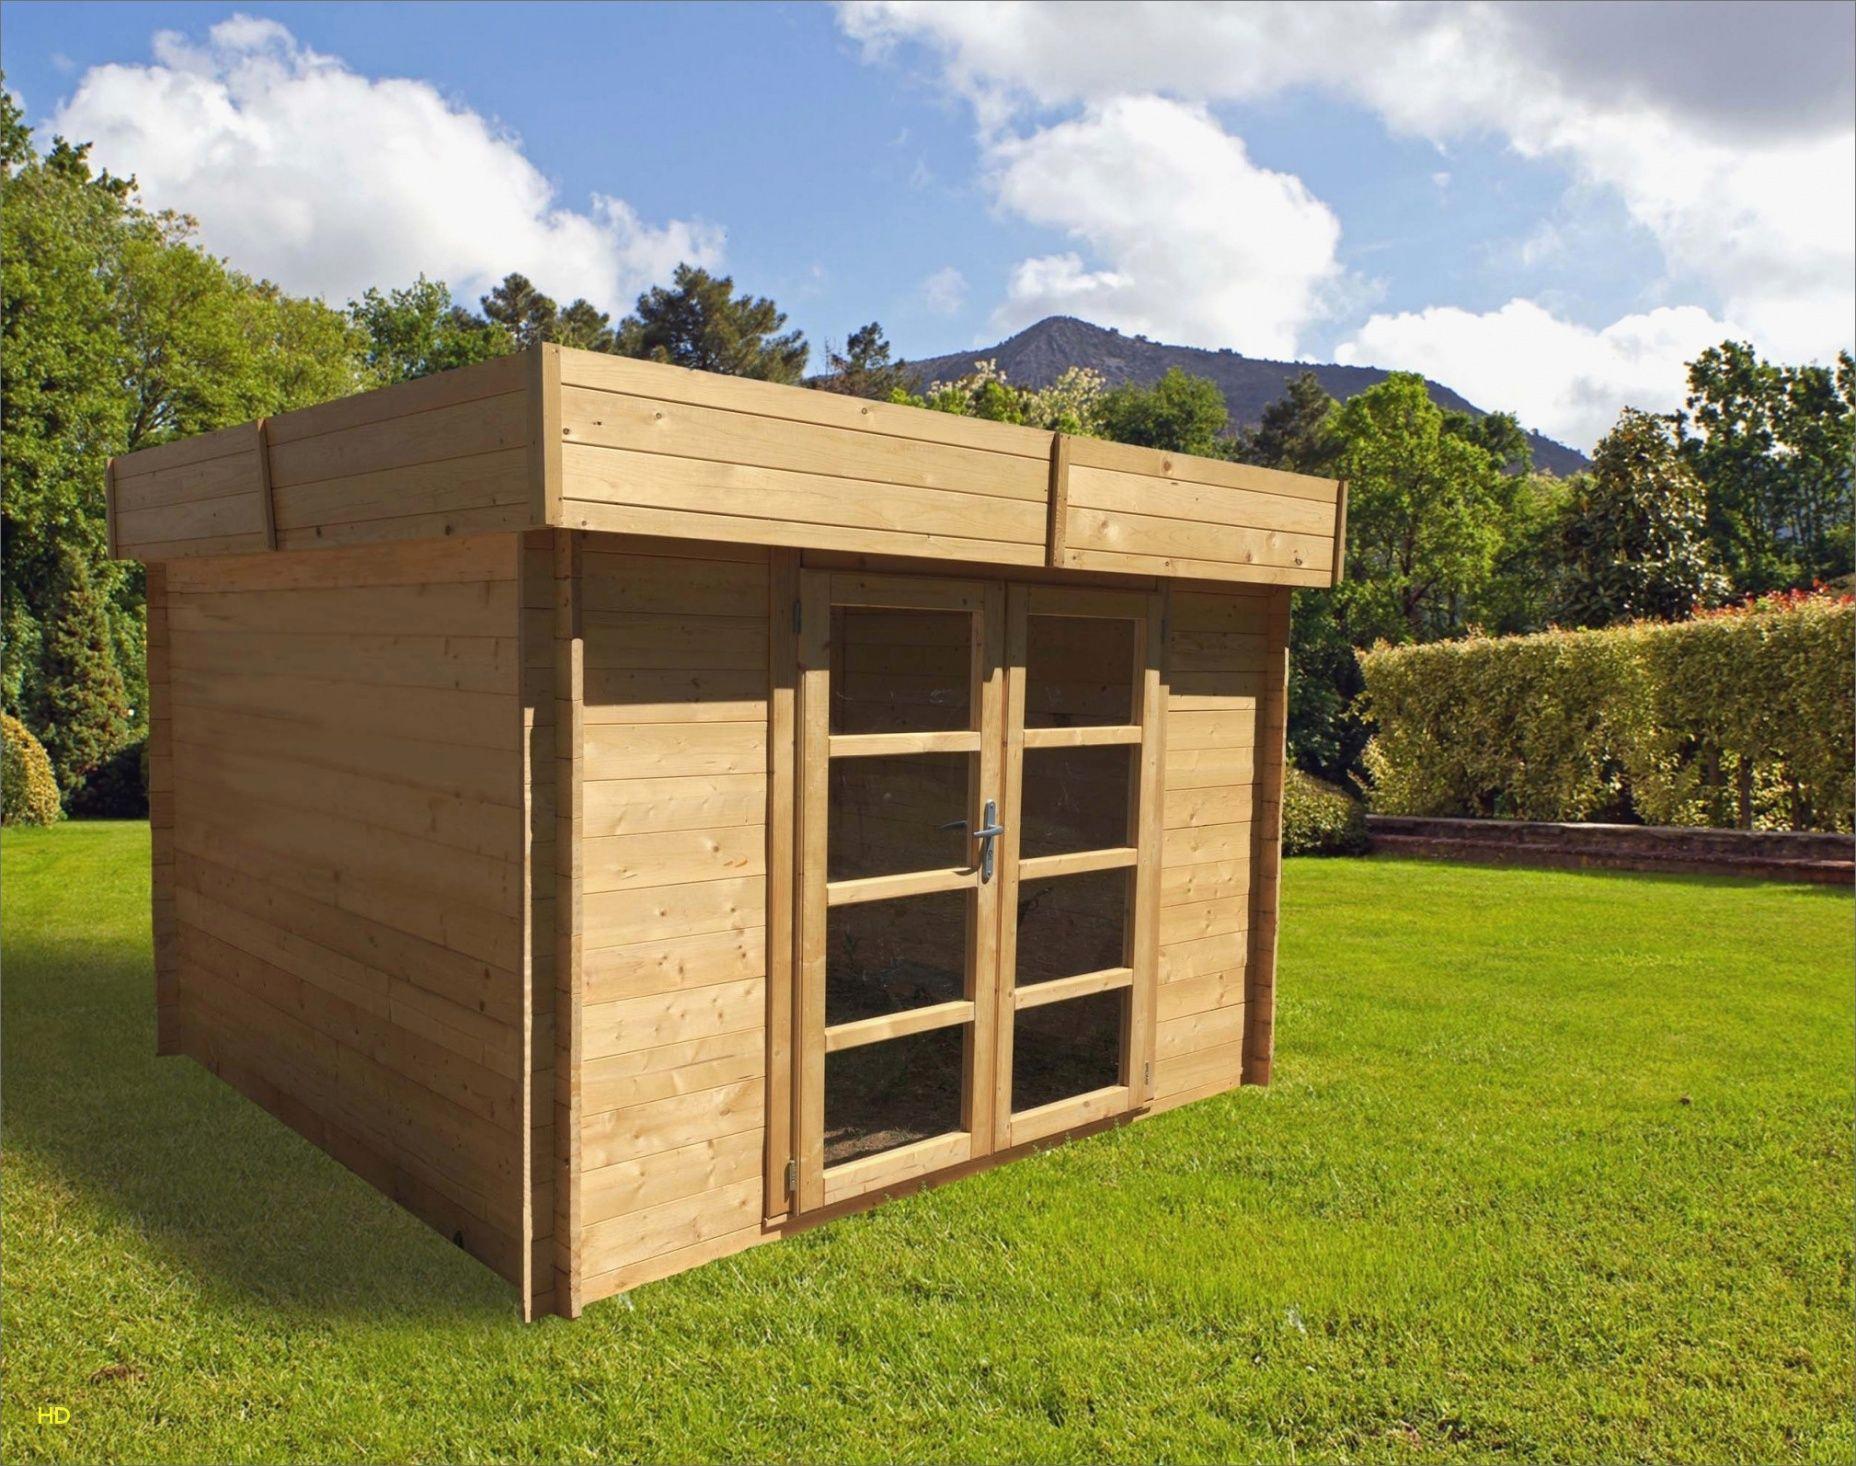 abri de jardin keter nouveau keter abri de jardin ou rpc abri de jardin imitation bois of abri de jardin keter